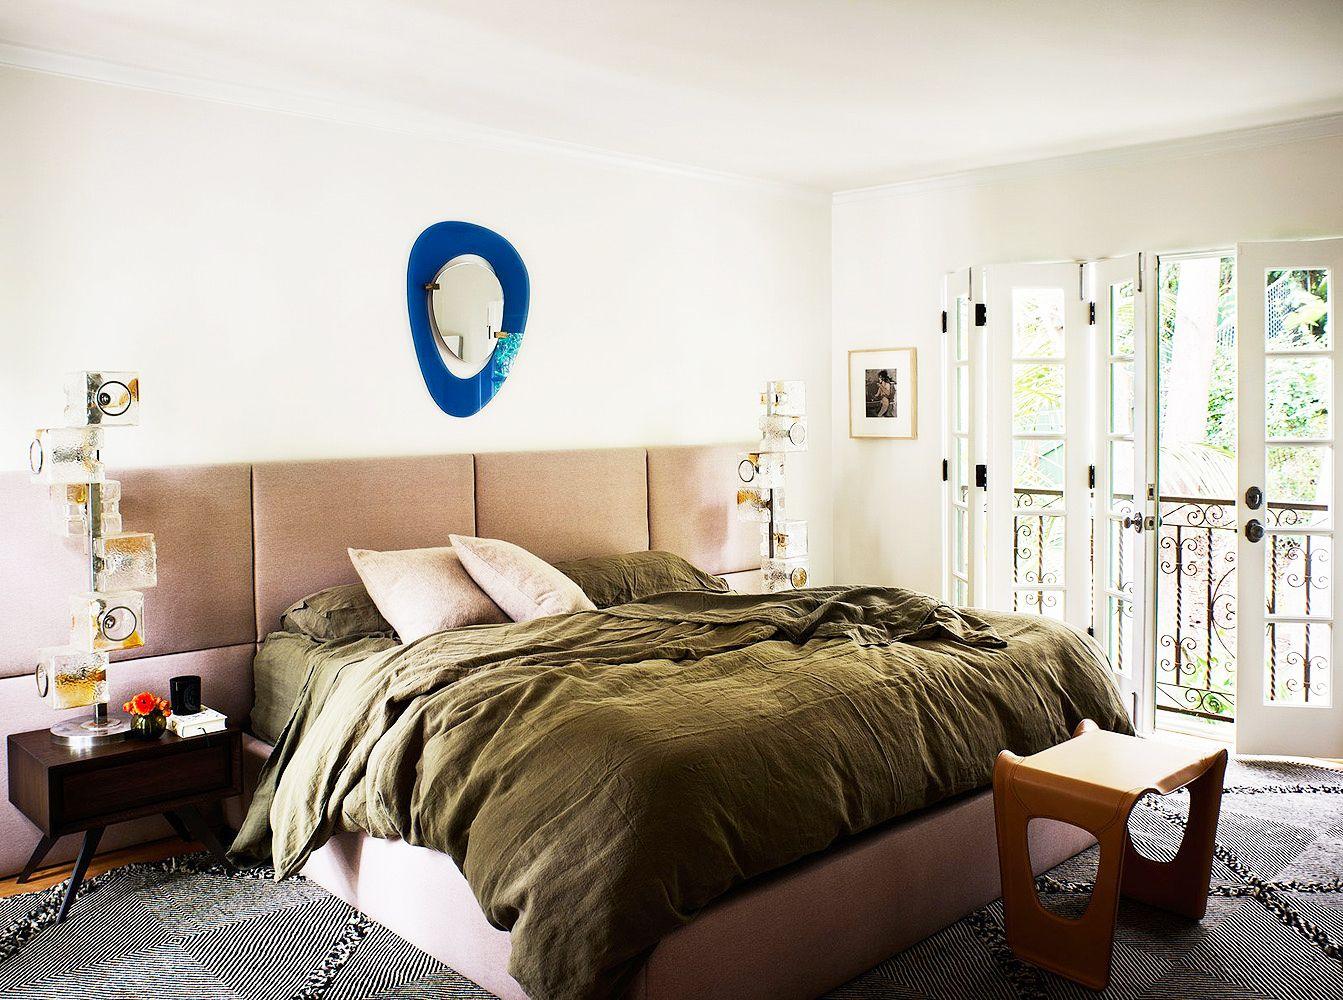 64 Stylish Bedroom Design Ideas Modern Bedrooms Decorating Tips